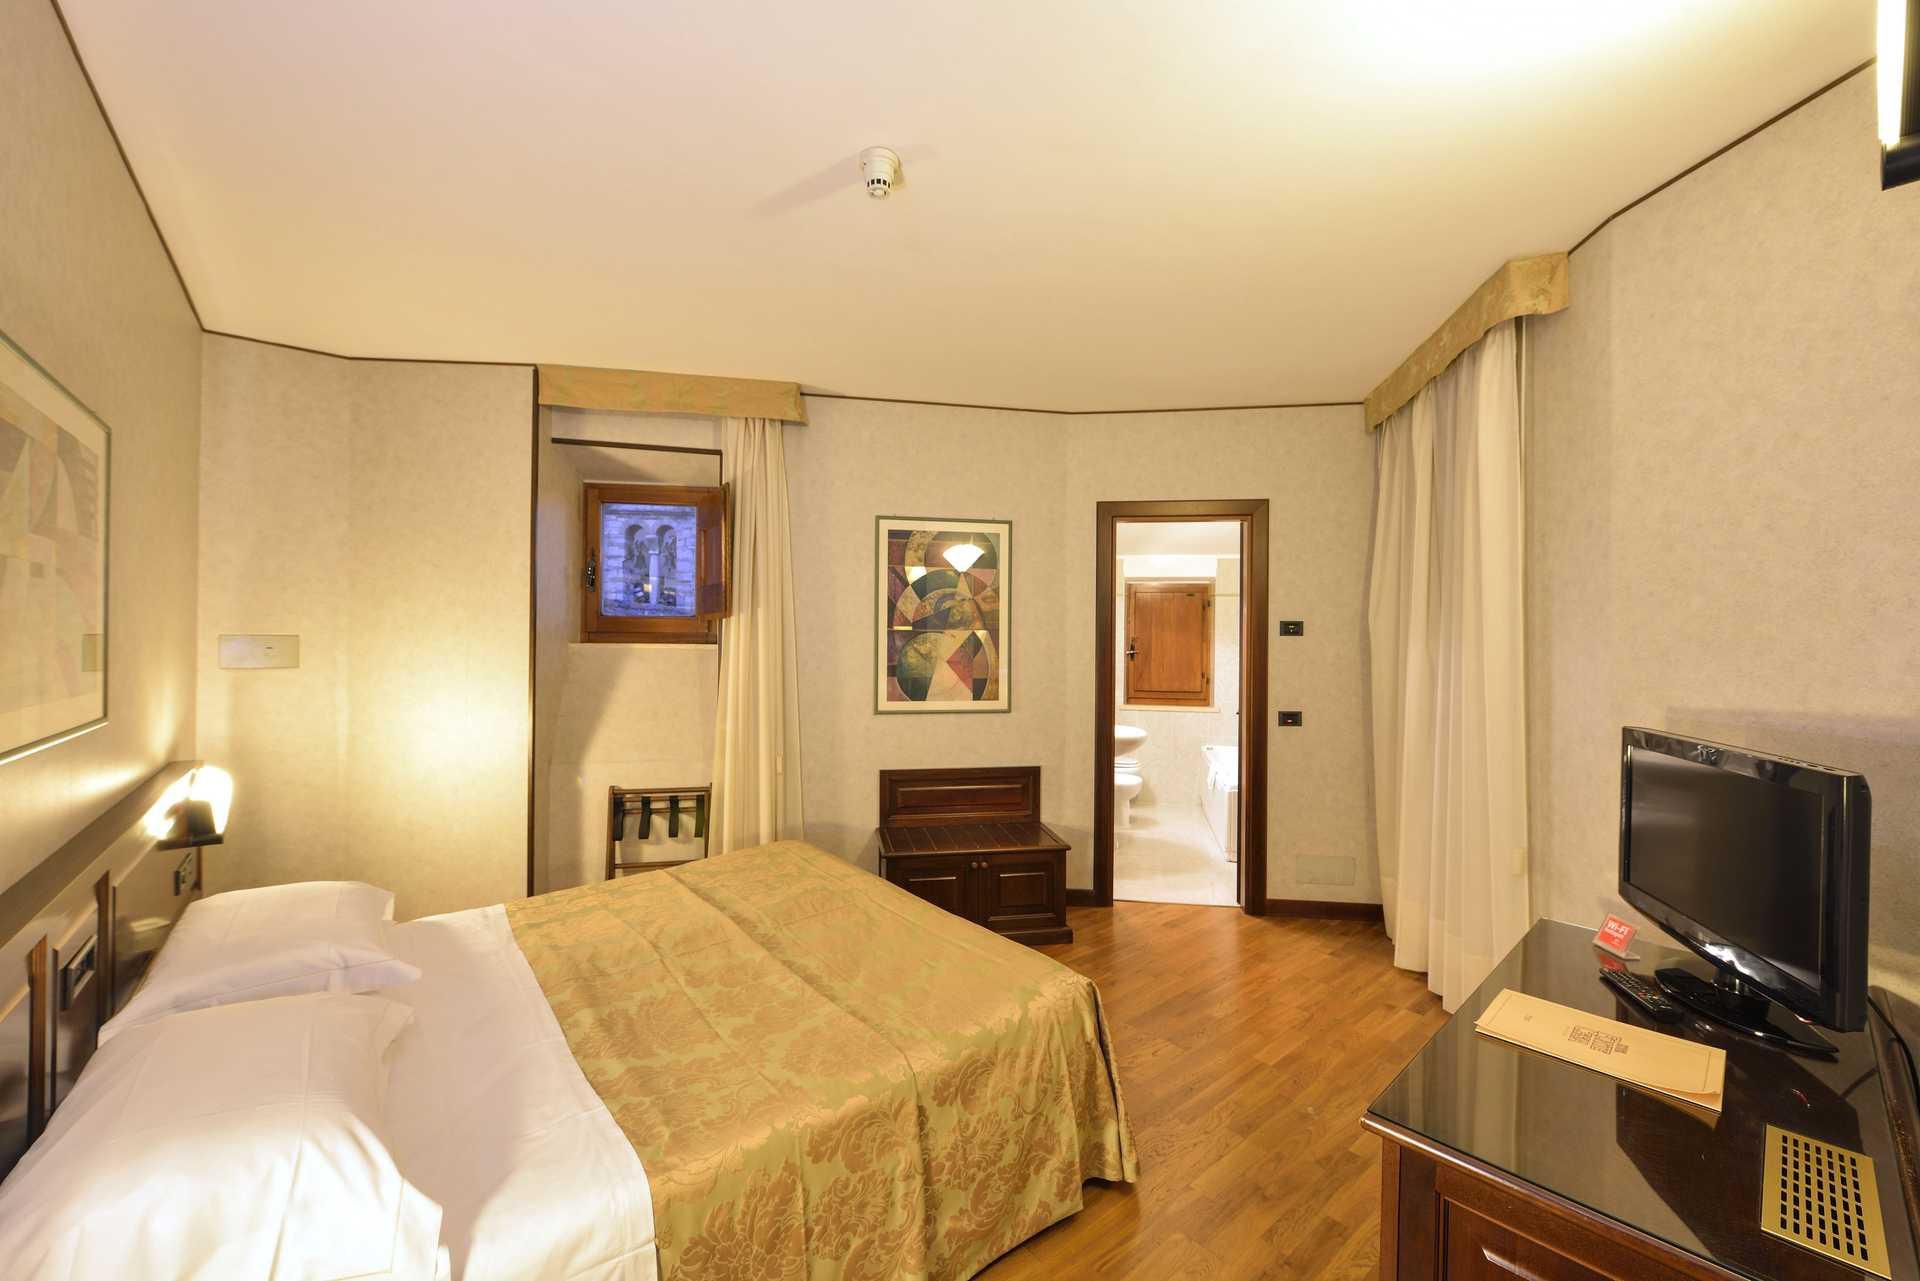 Hotel Fonte Cesia - classic rooms-Camera classica